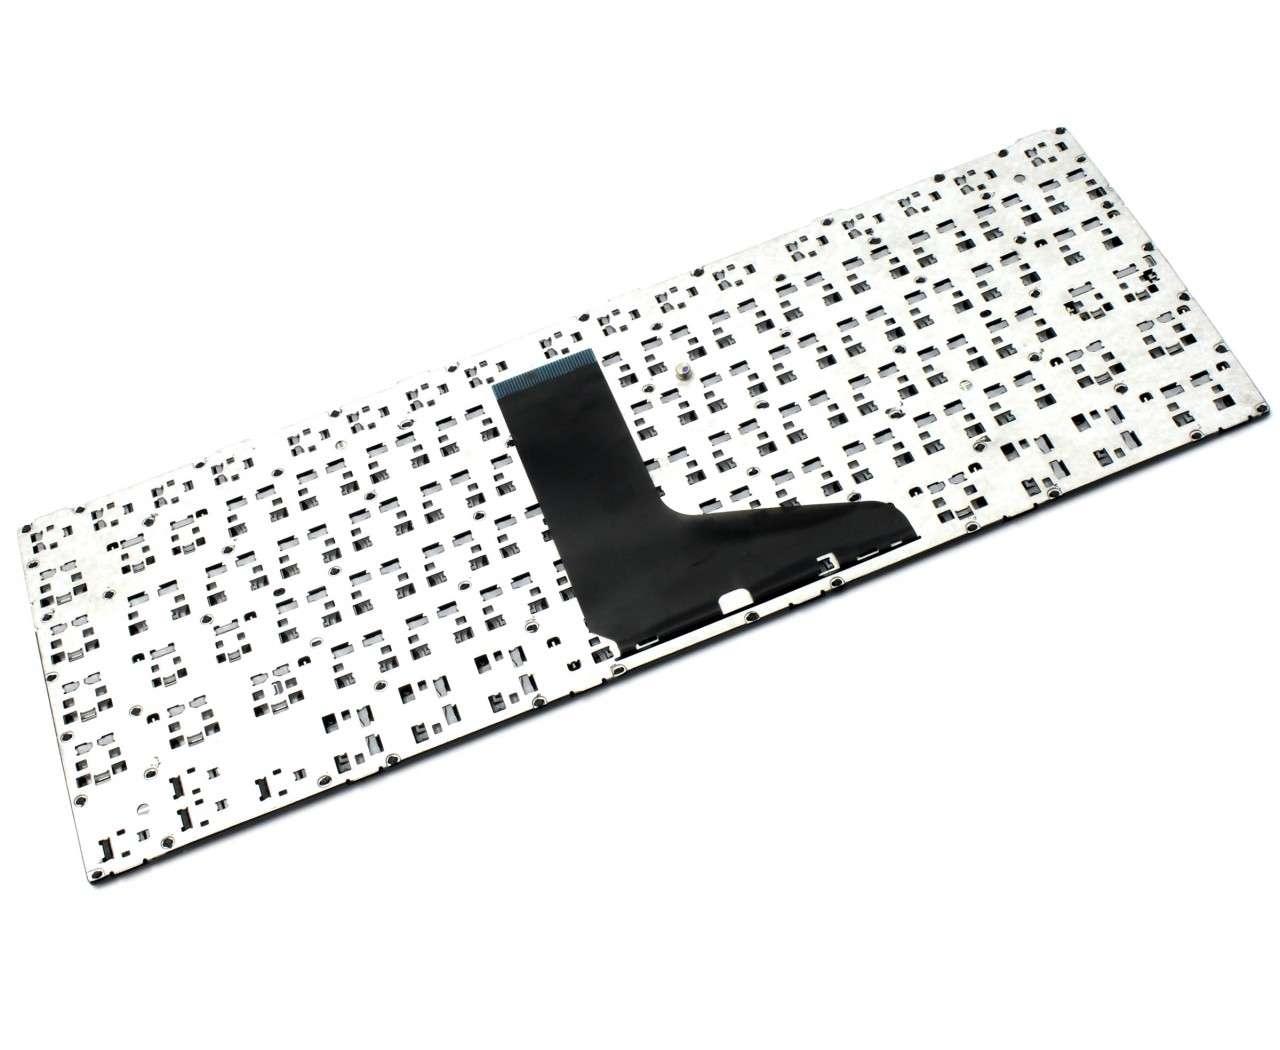 Tastatura Toshiba Satellite L800 imagine powerlaptop.ro 2021